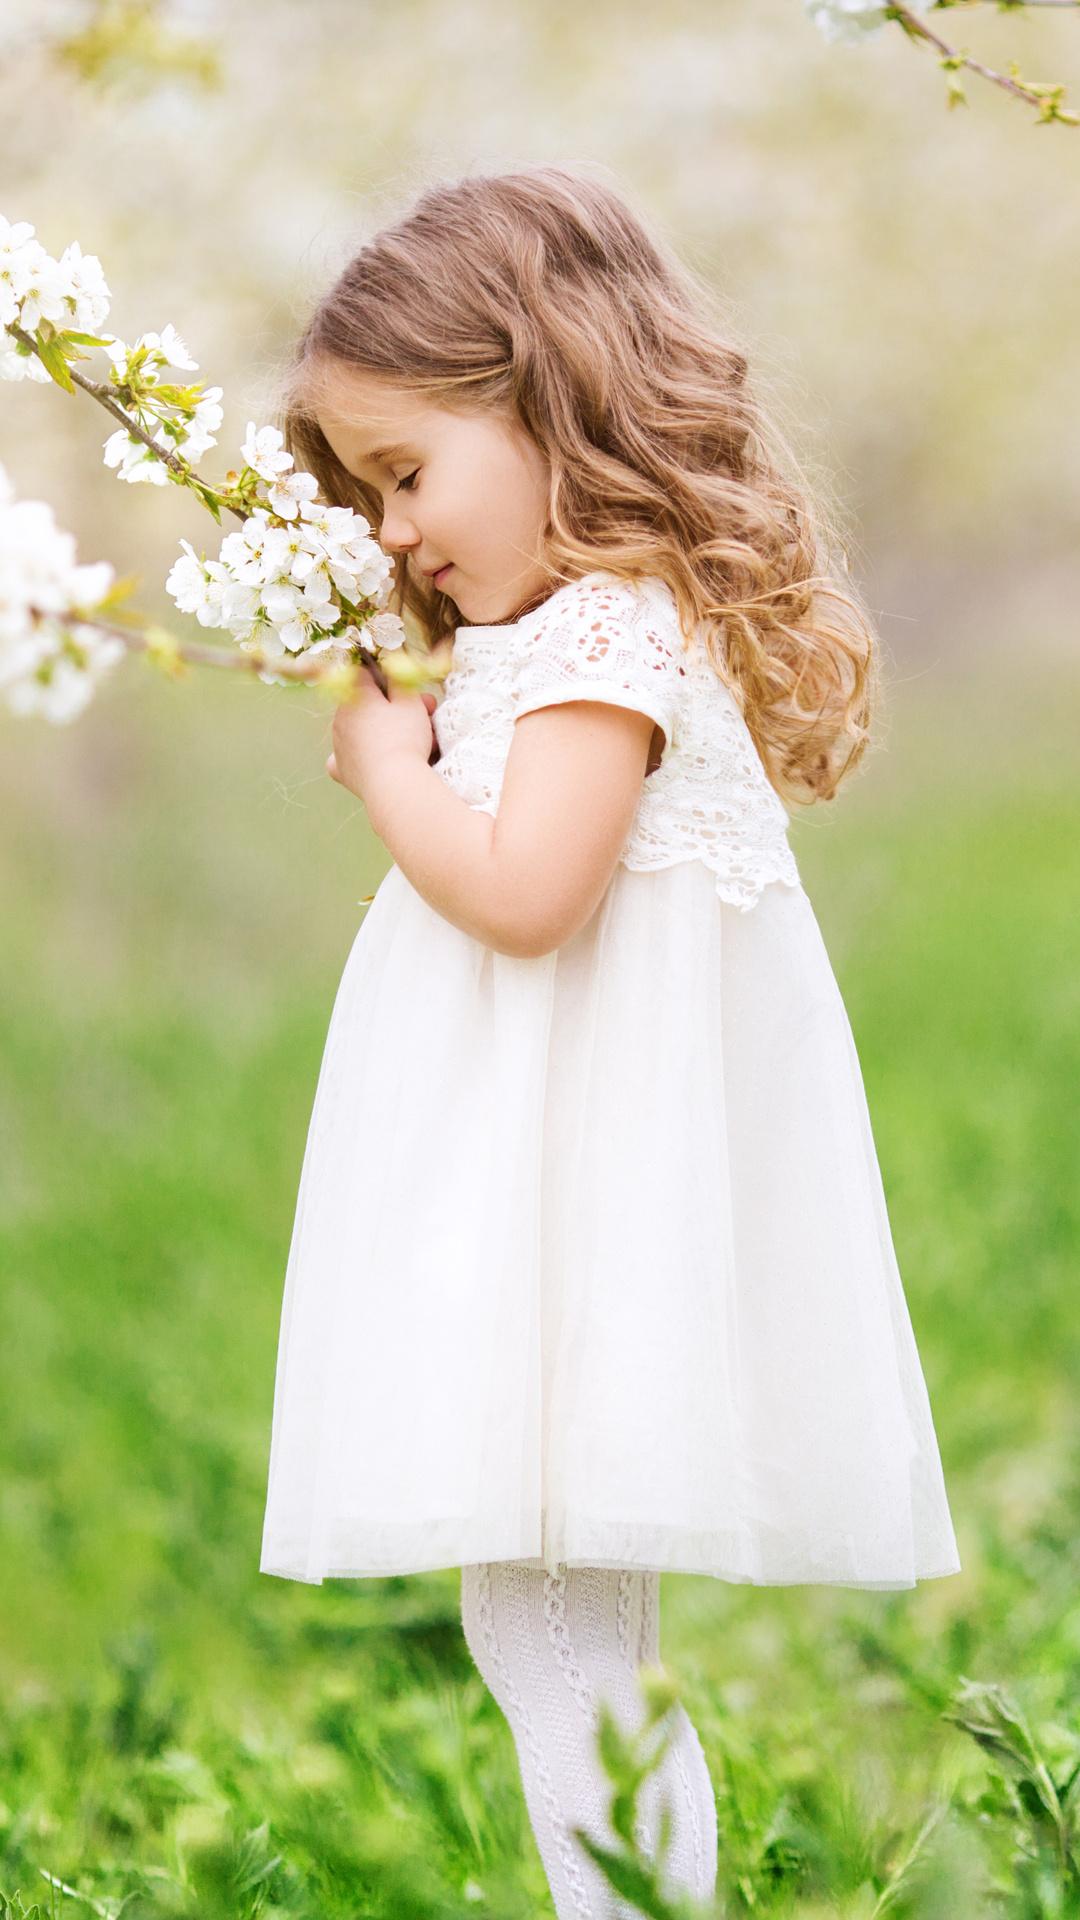 little-cute-girl-smelling-flowers-1k.jpg